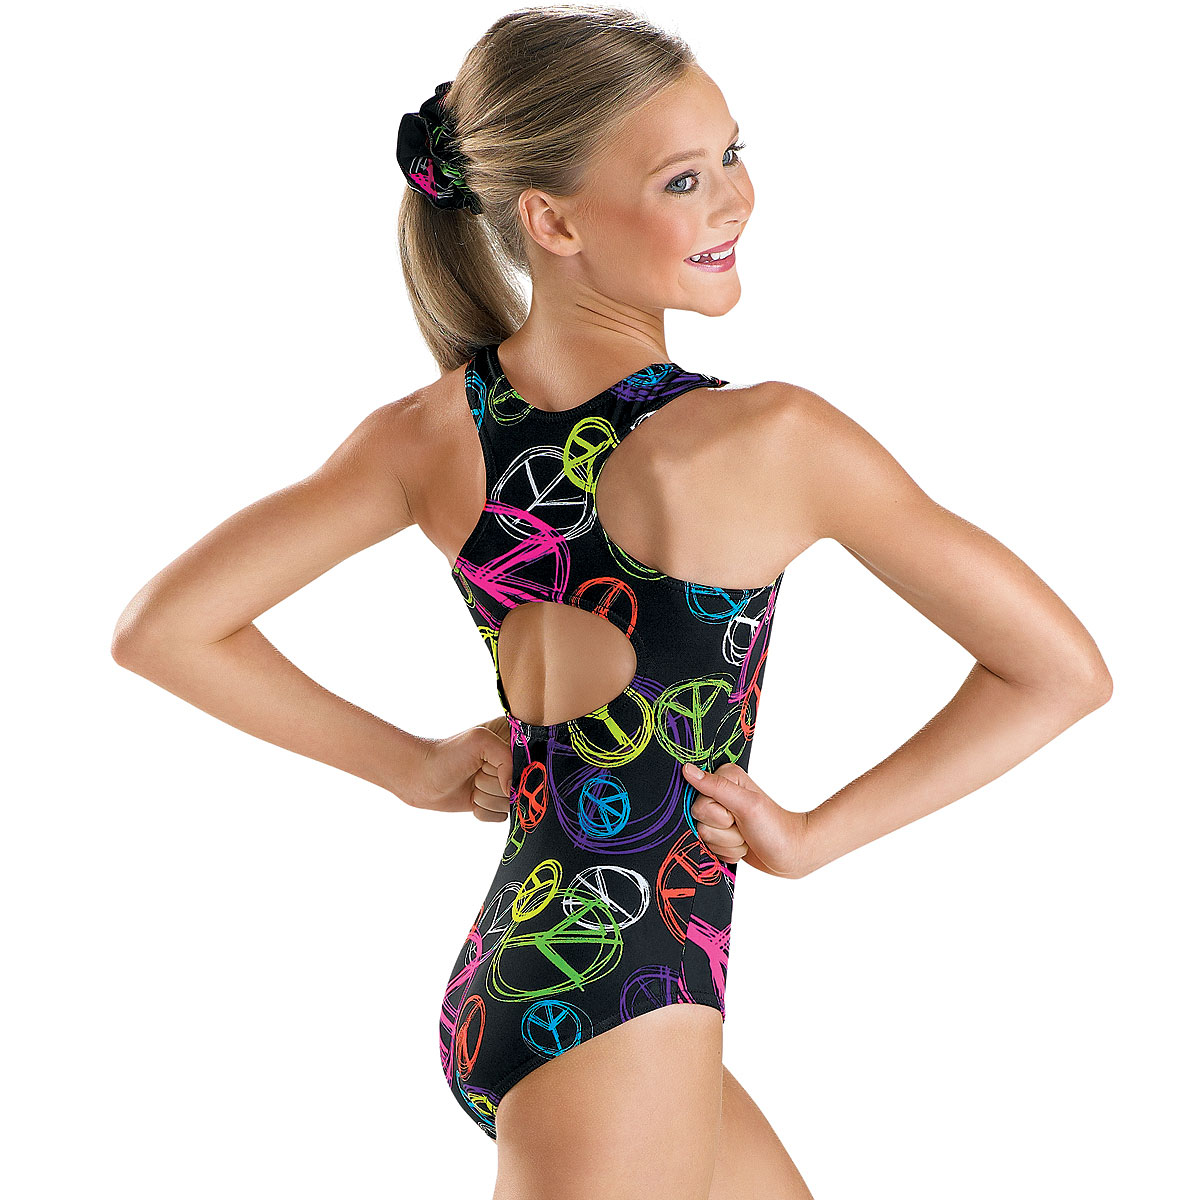 b52763b52 Cheap Gymnastics Leotards – Fashion dresses